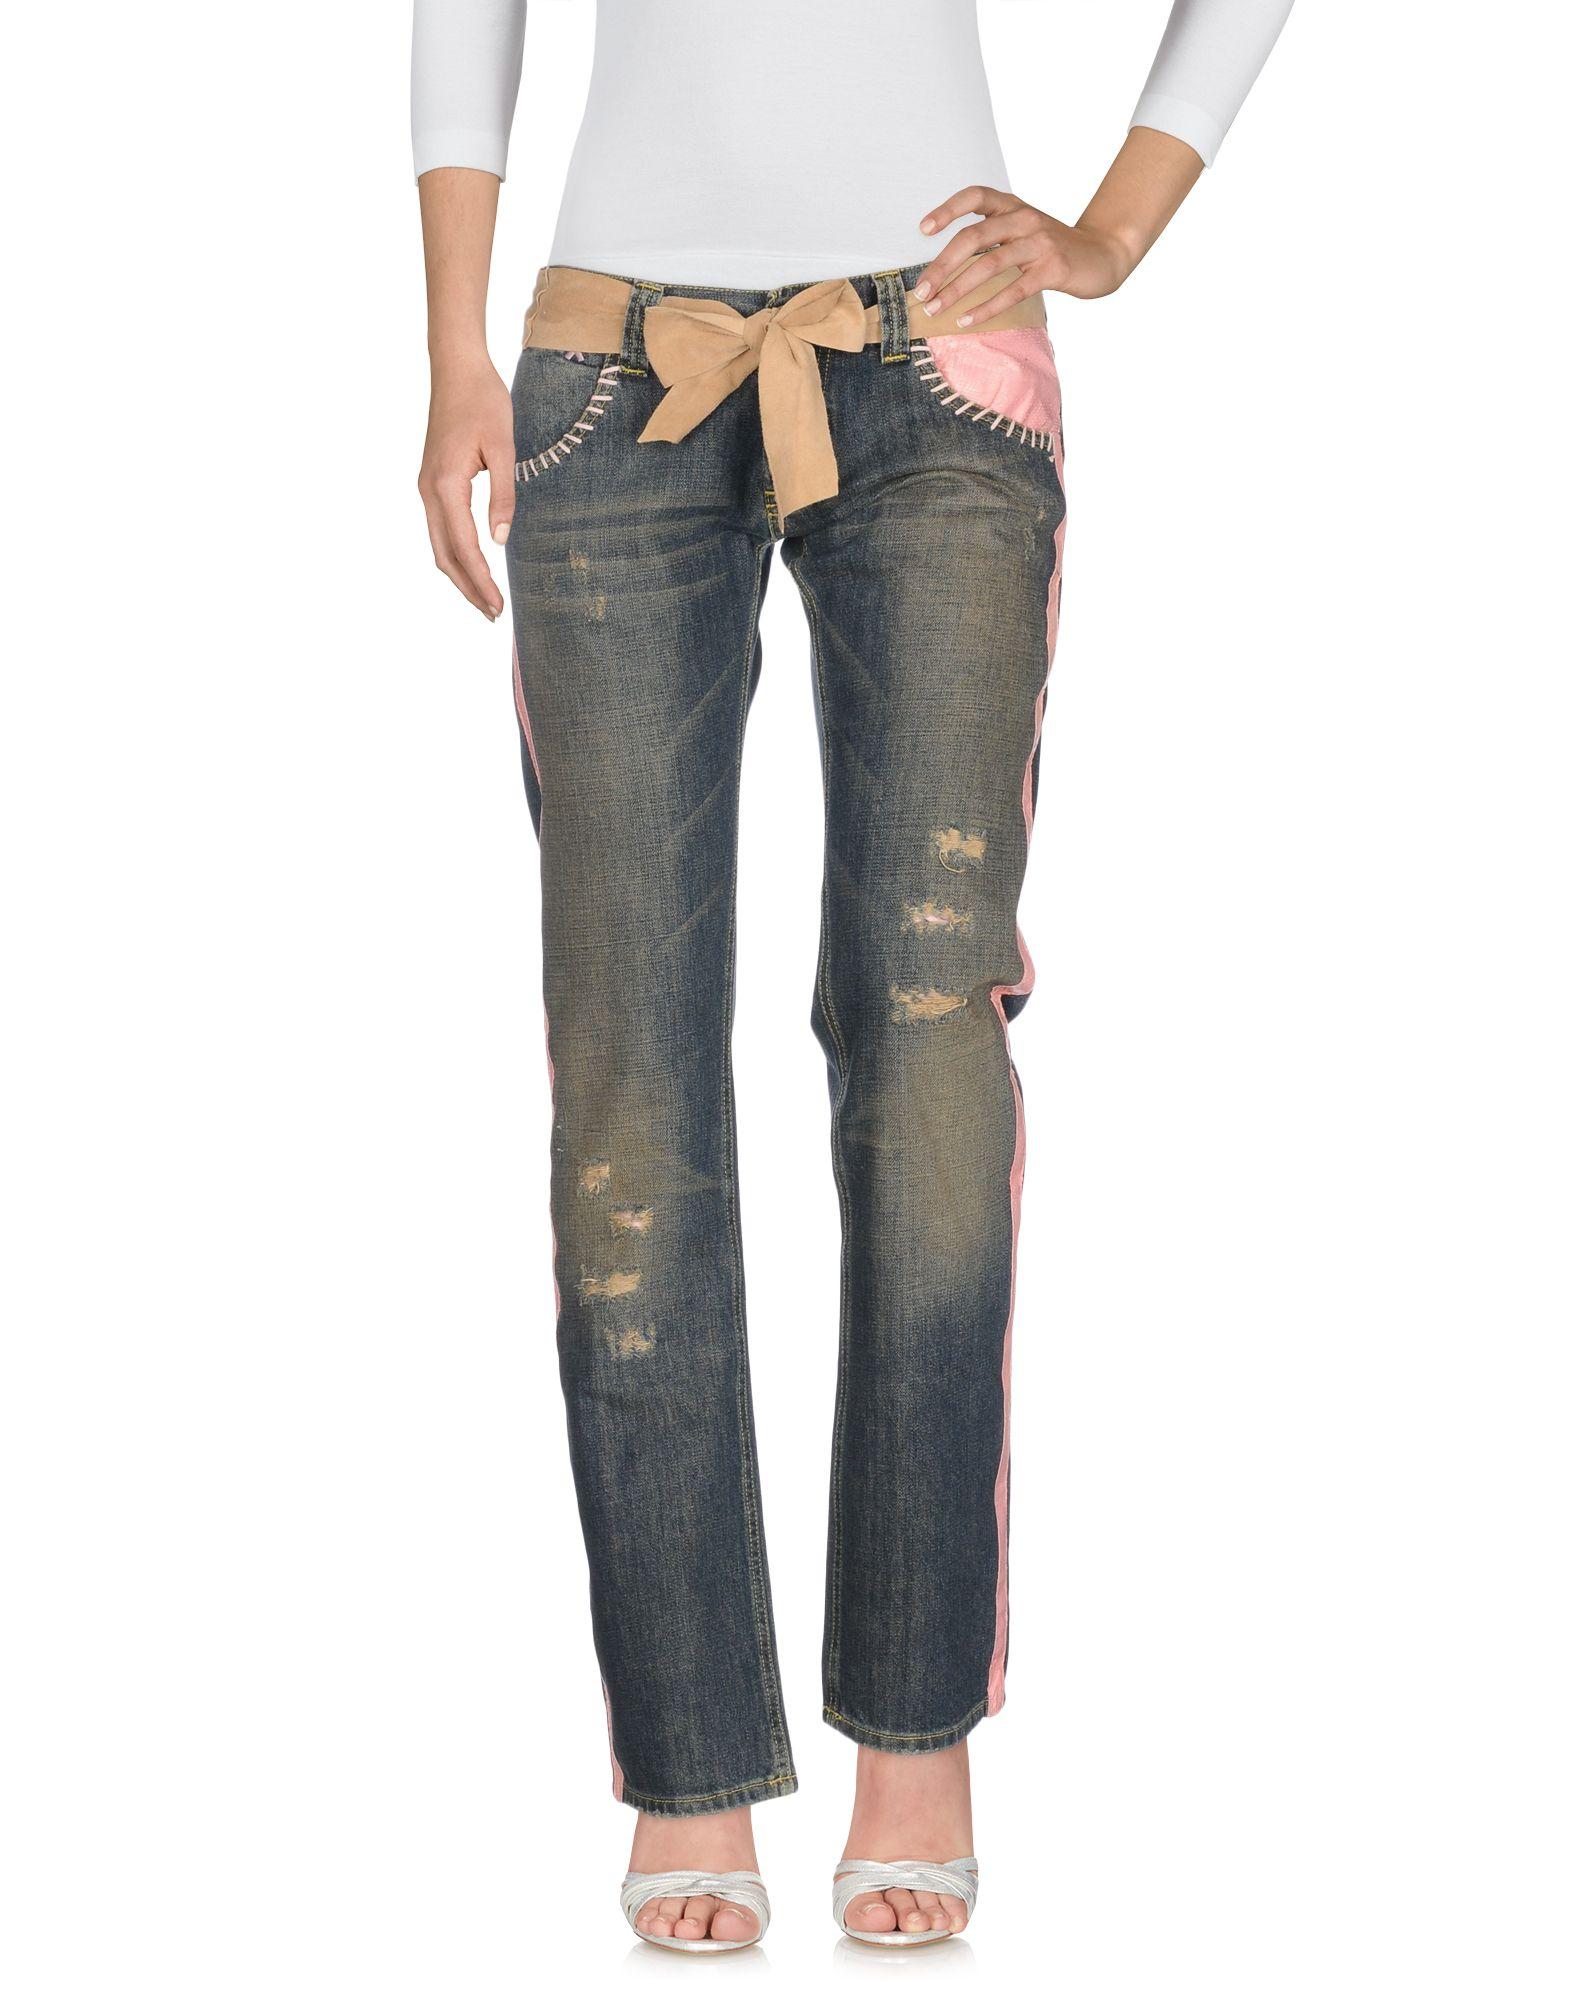 MONICA BIANCO Damen Jeanshose Farbe Blau Größe 7